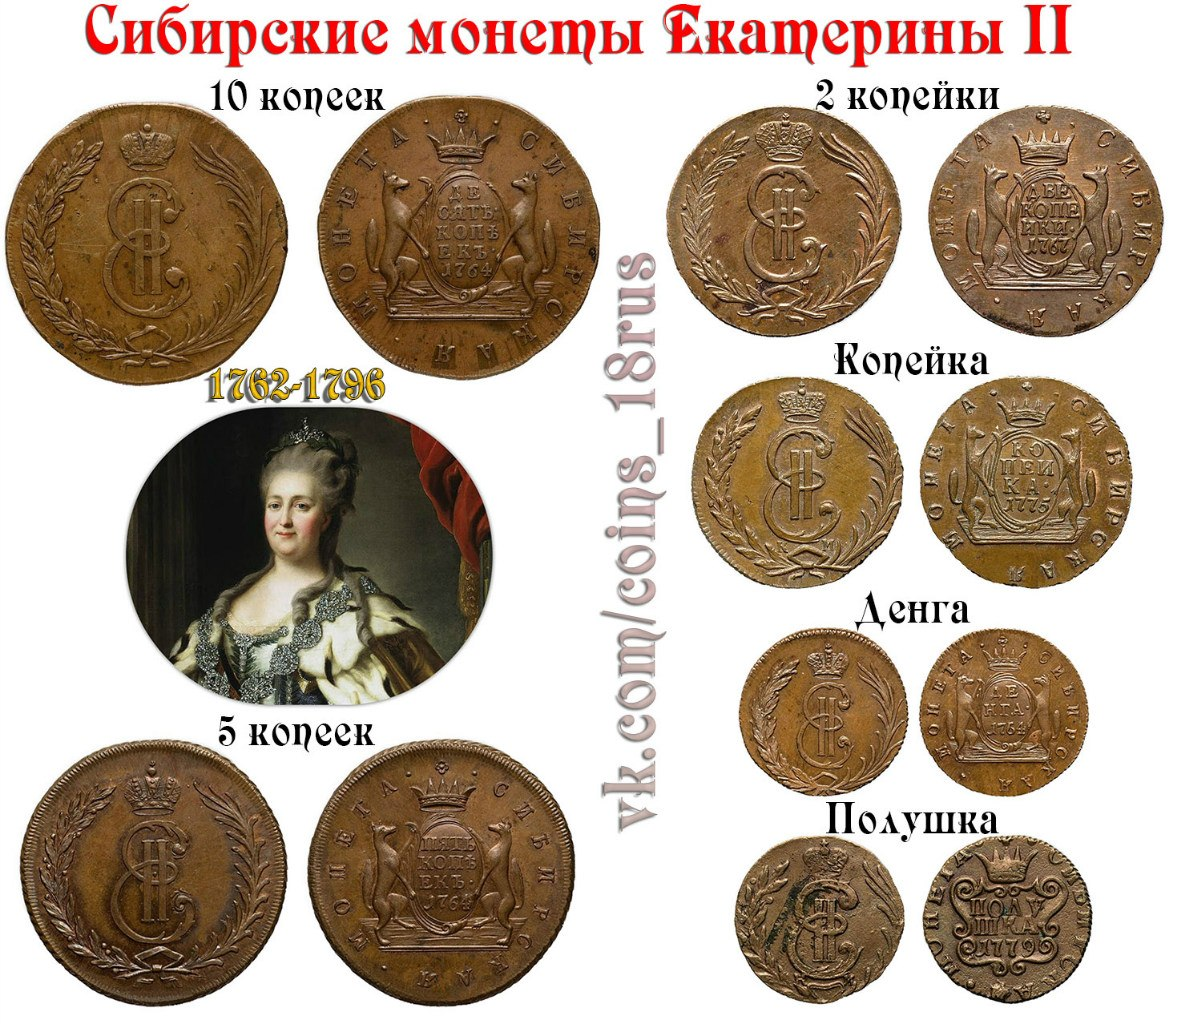 Сибирские монеты КМ